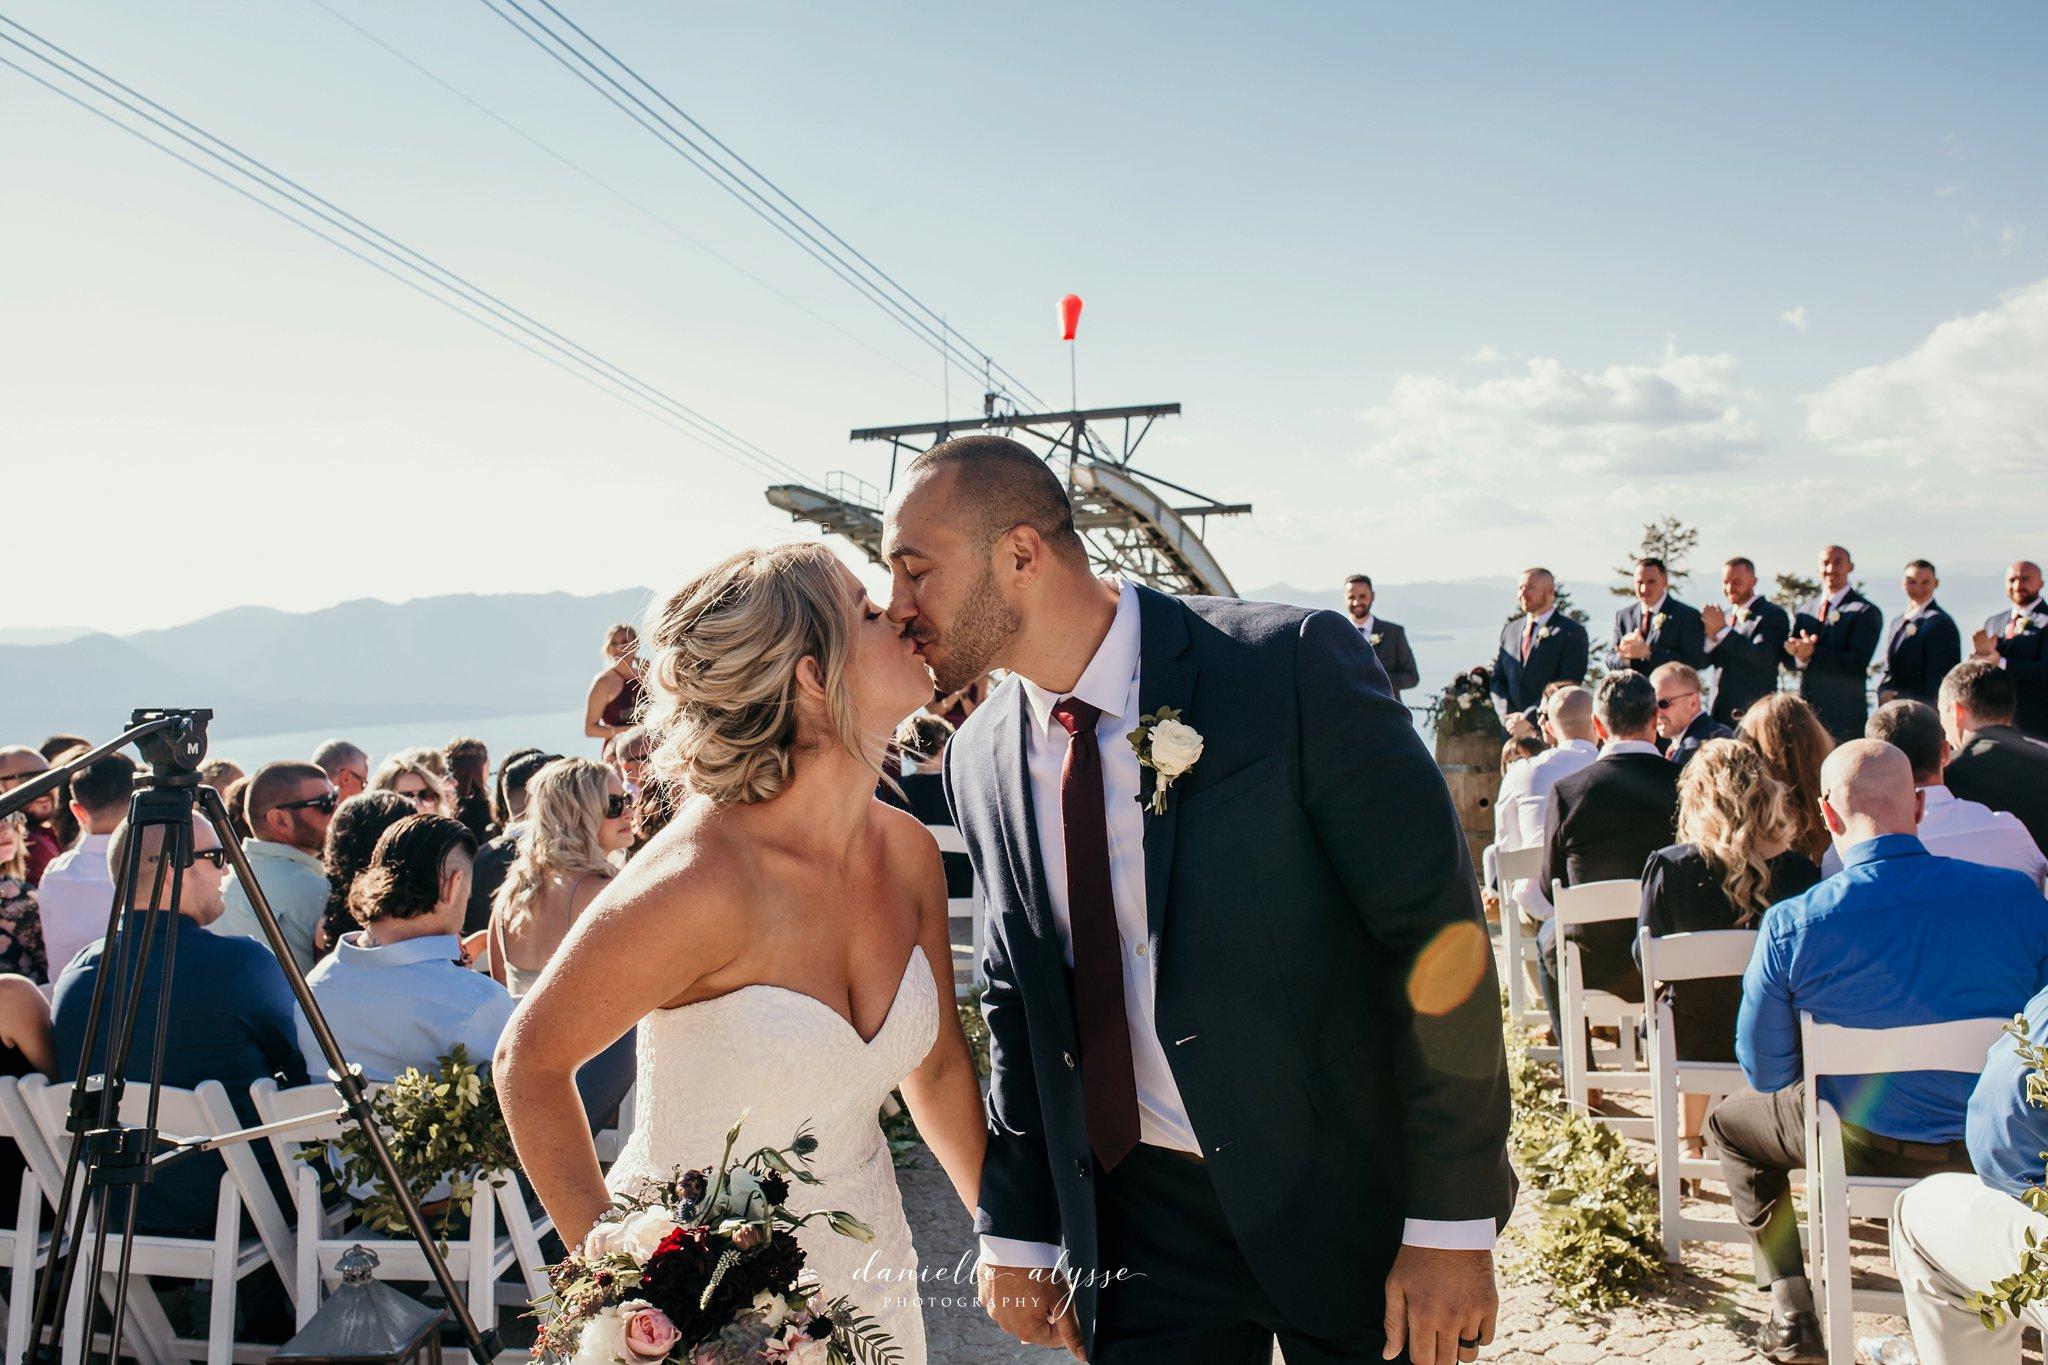 180831_wedding_stephanie_heavenly_south_lake_tahoe_danielle_alysse_photography_destination_blog_745_WEB.jpg